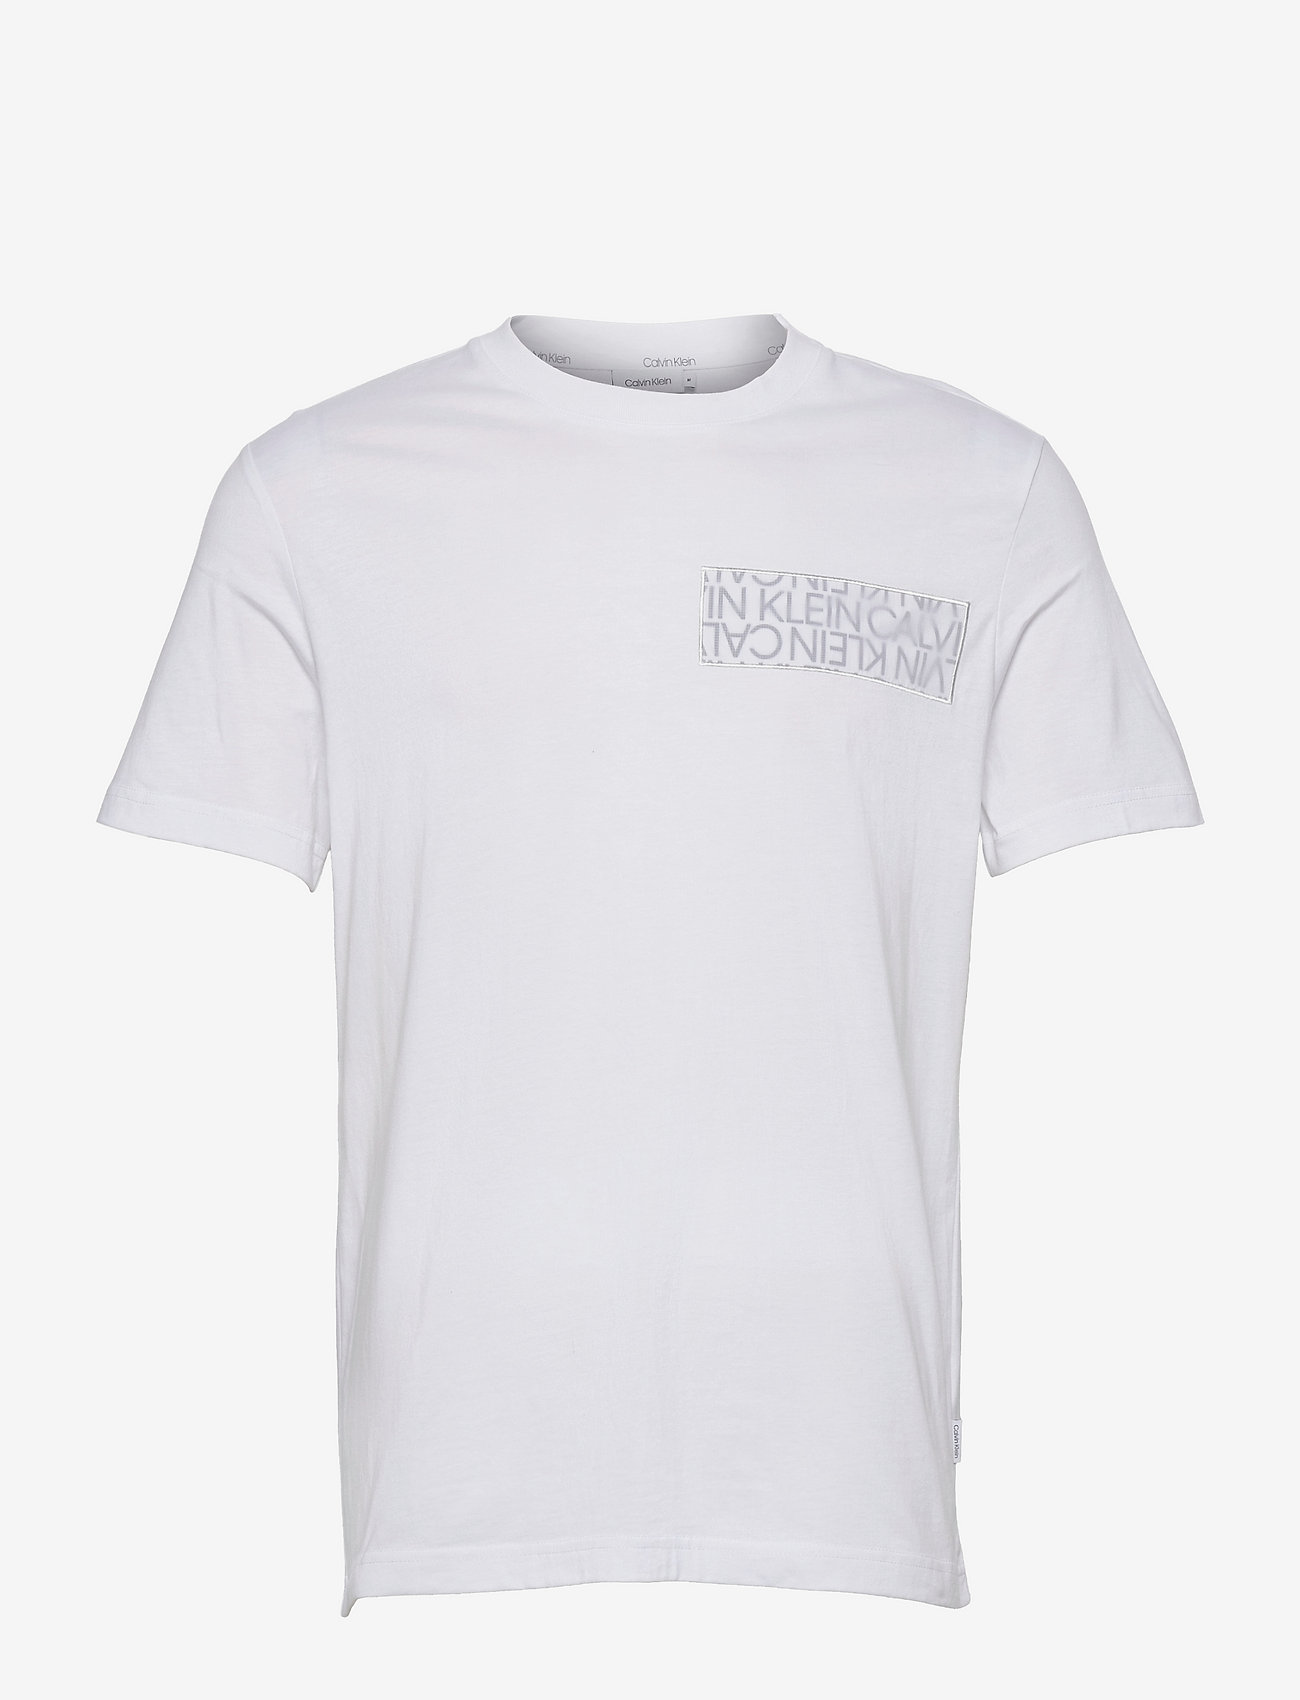 Calvin Klein - LOGO LINES BADGE T-SHIRT - t-shirts à manches courtes - bright white - 0